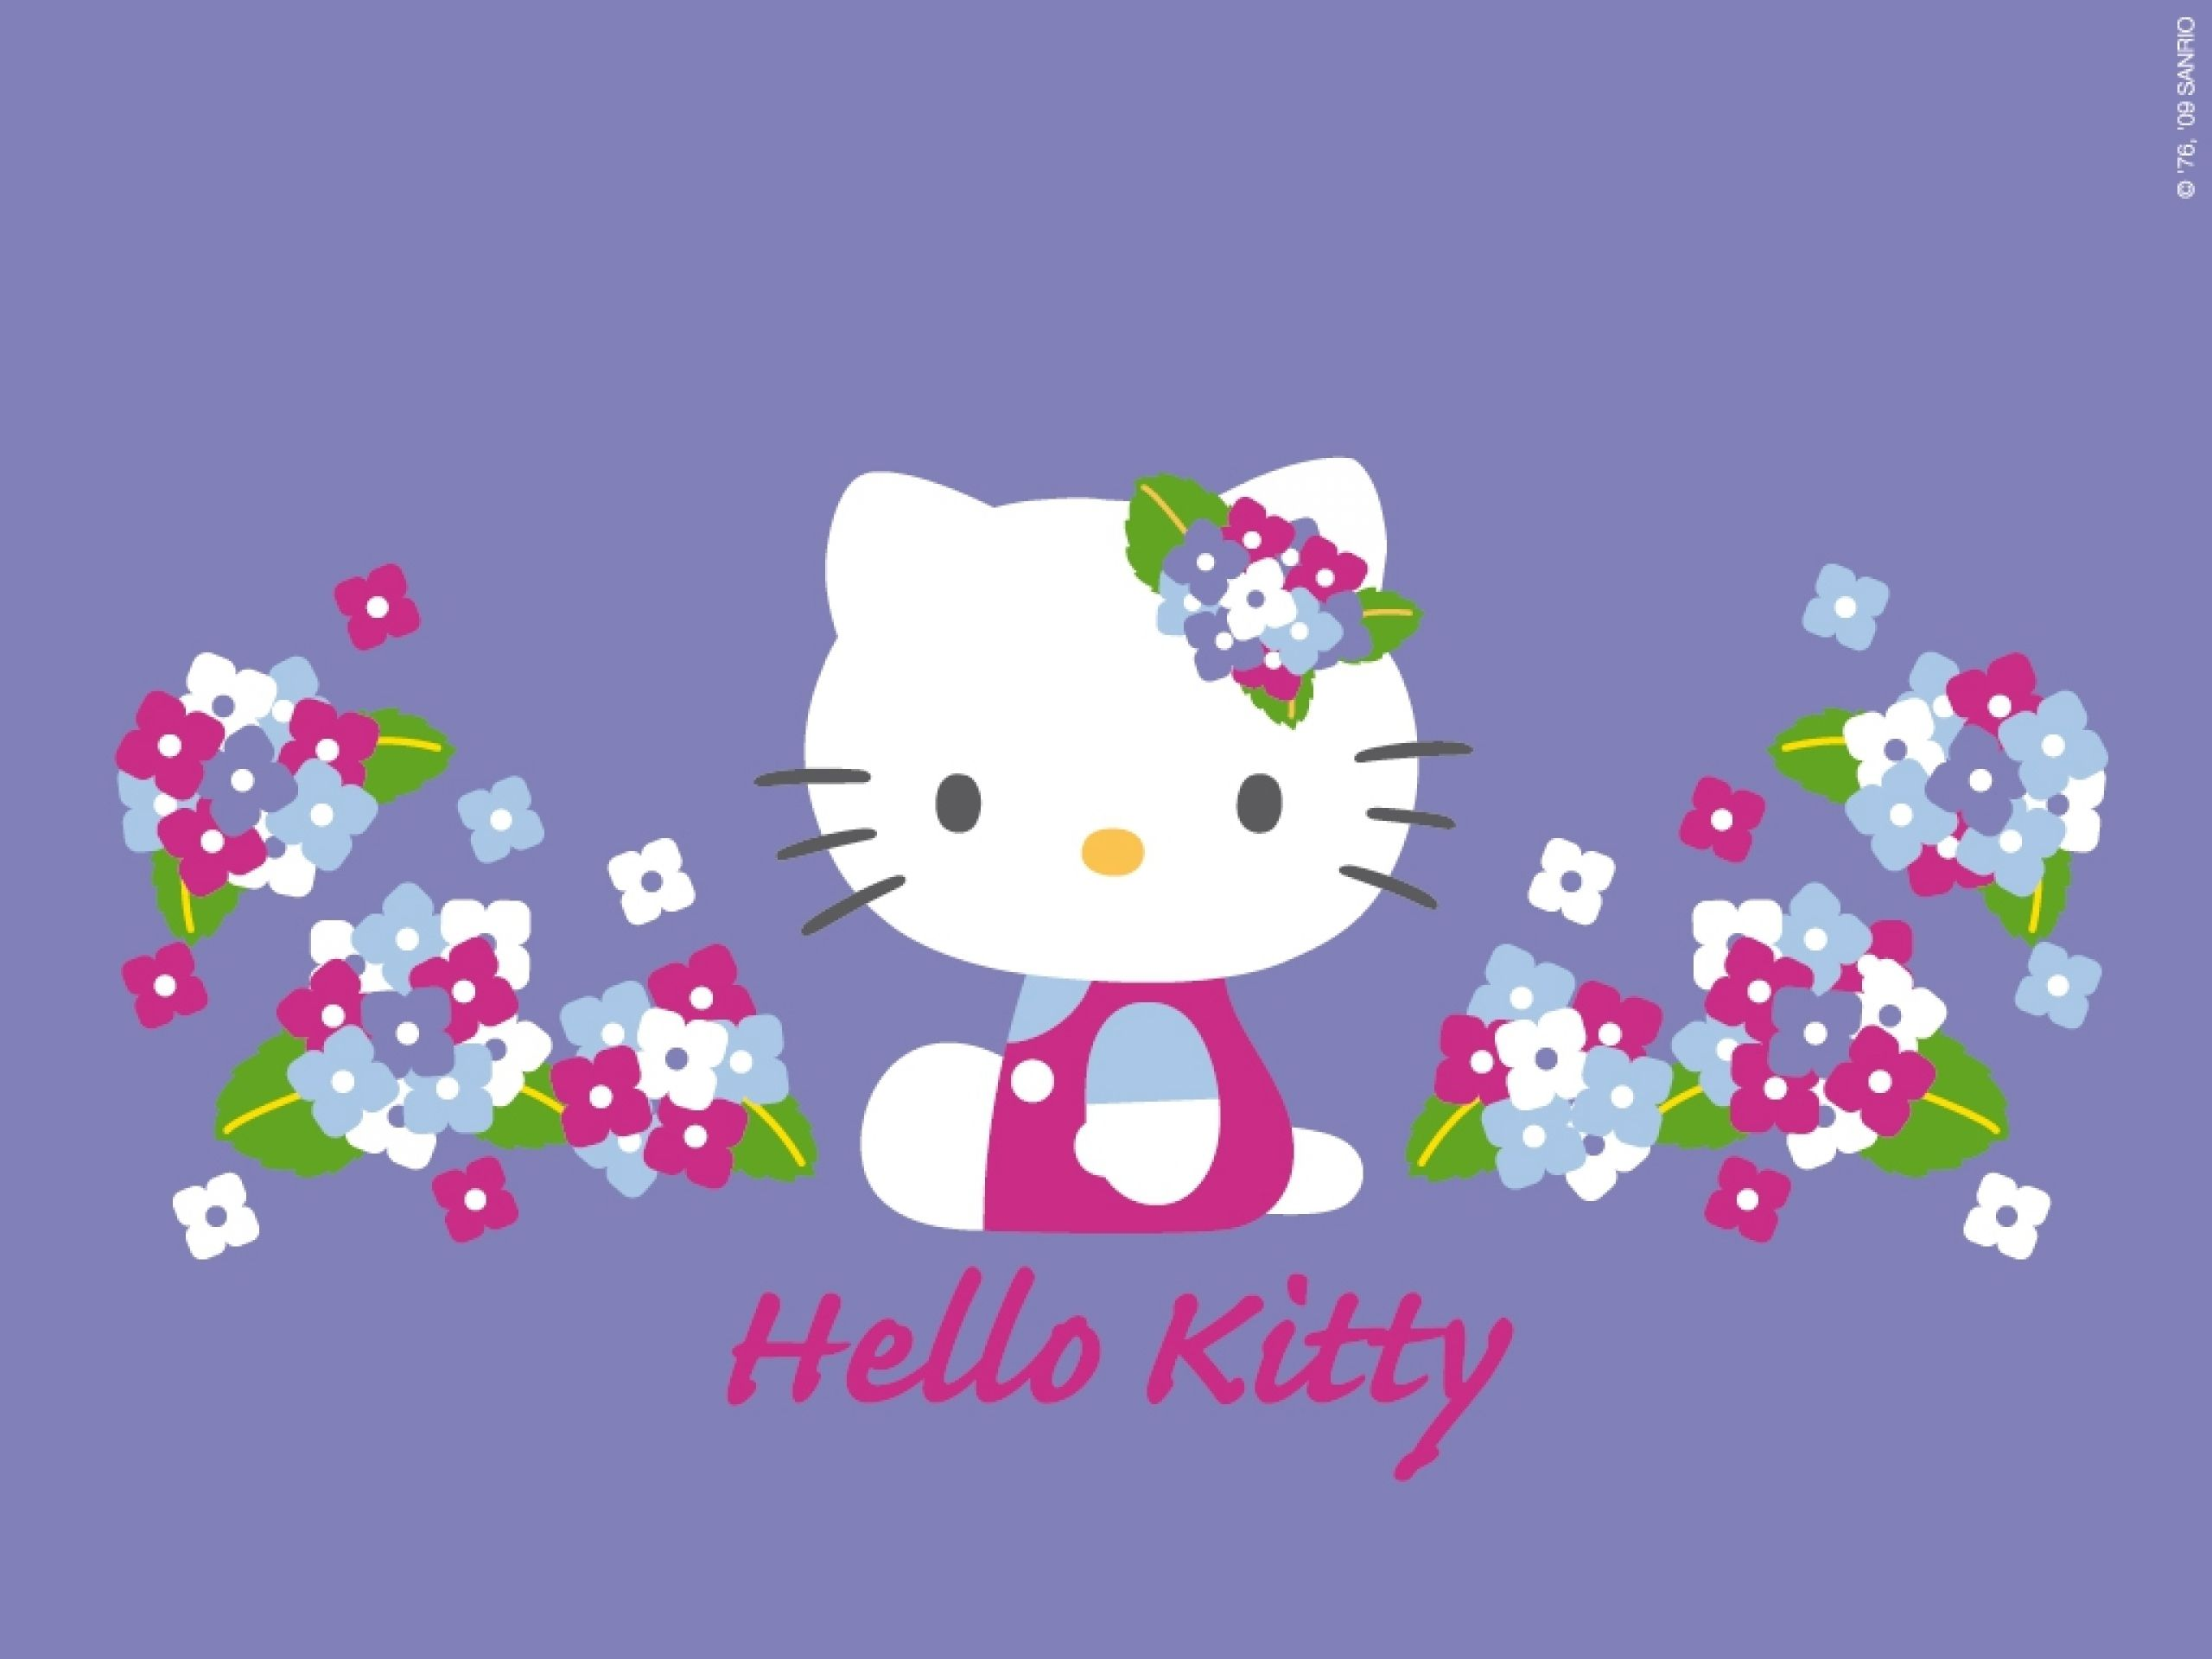 Looks - Kitty Hello zebra wallpaper video